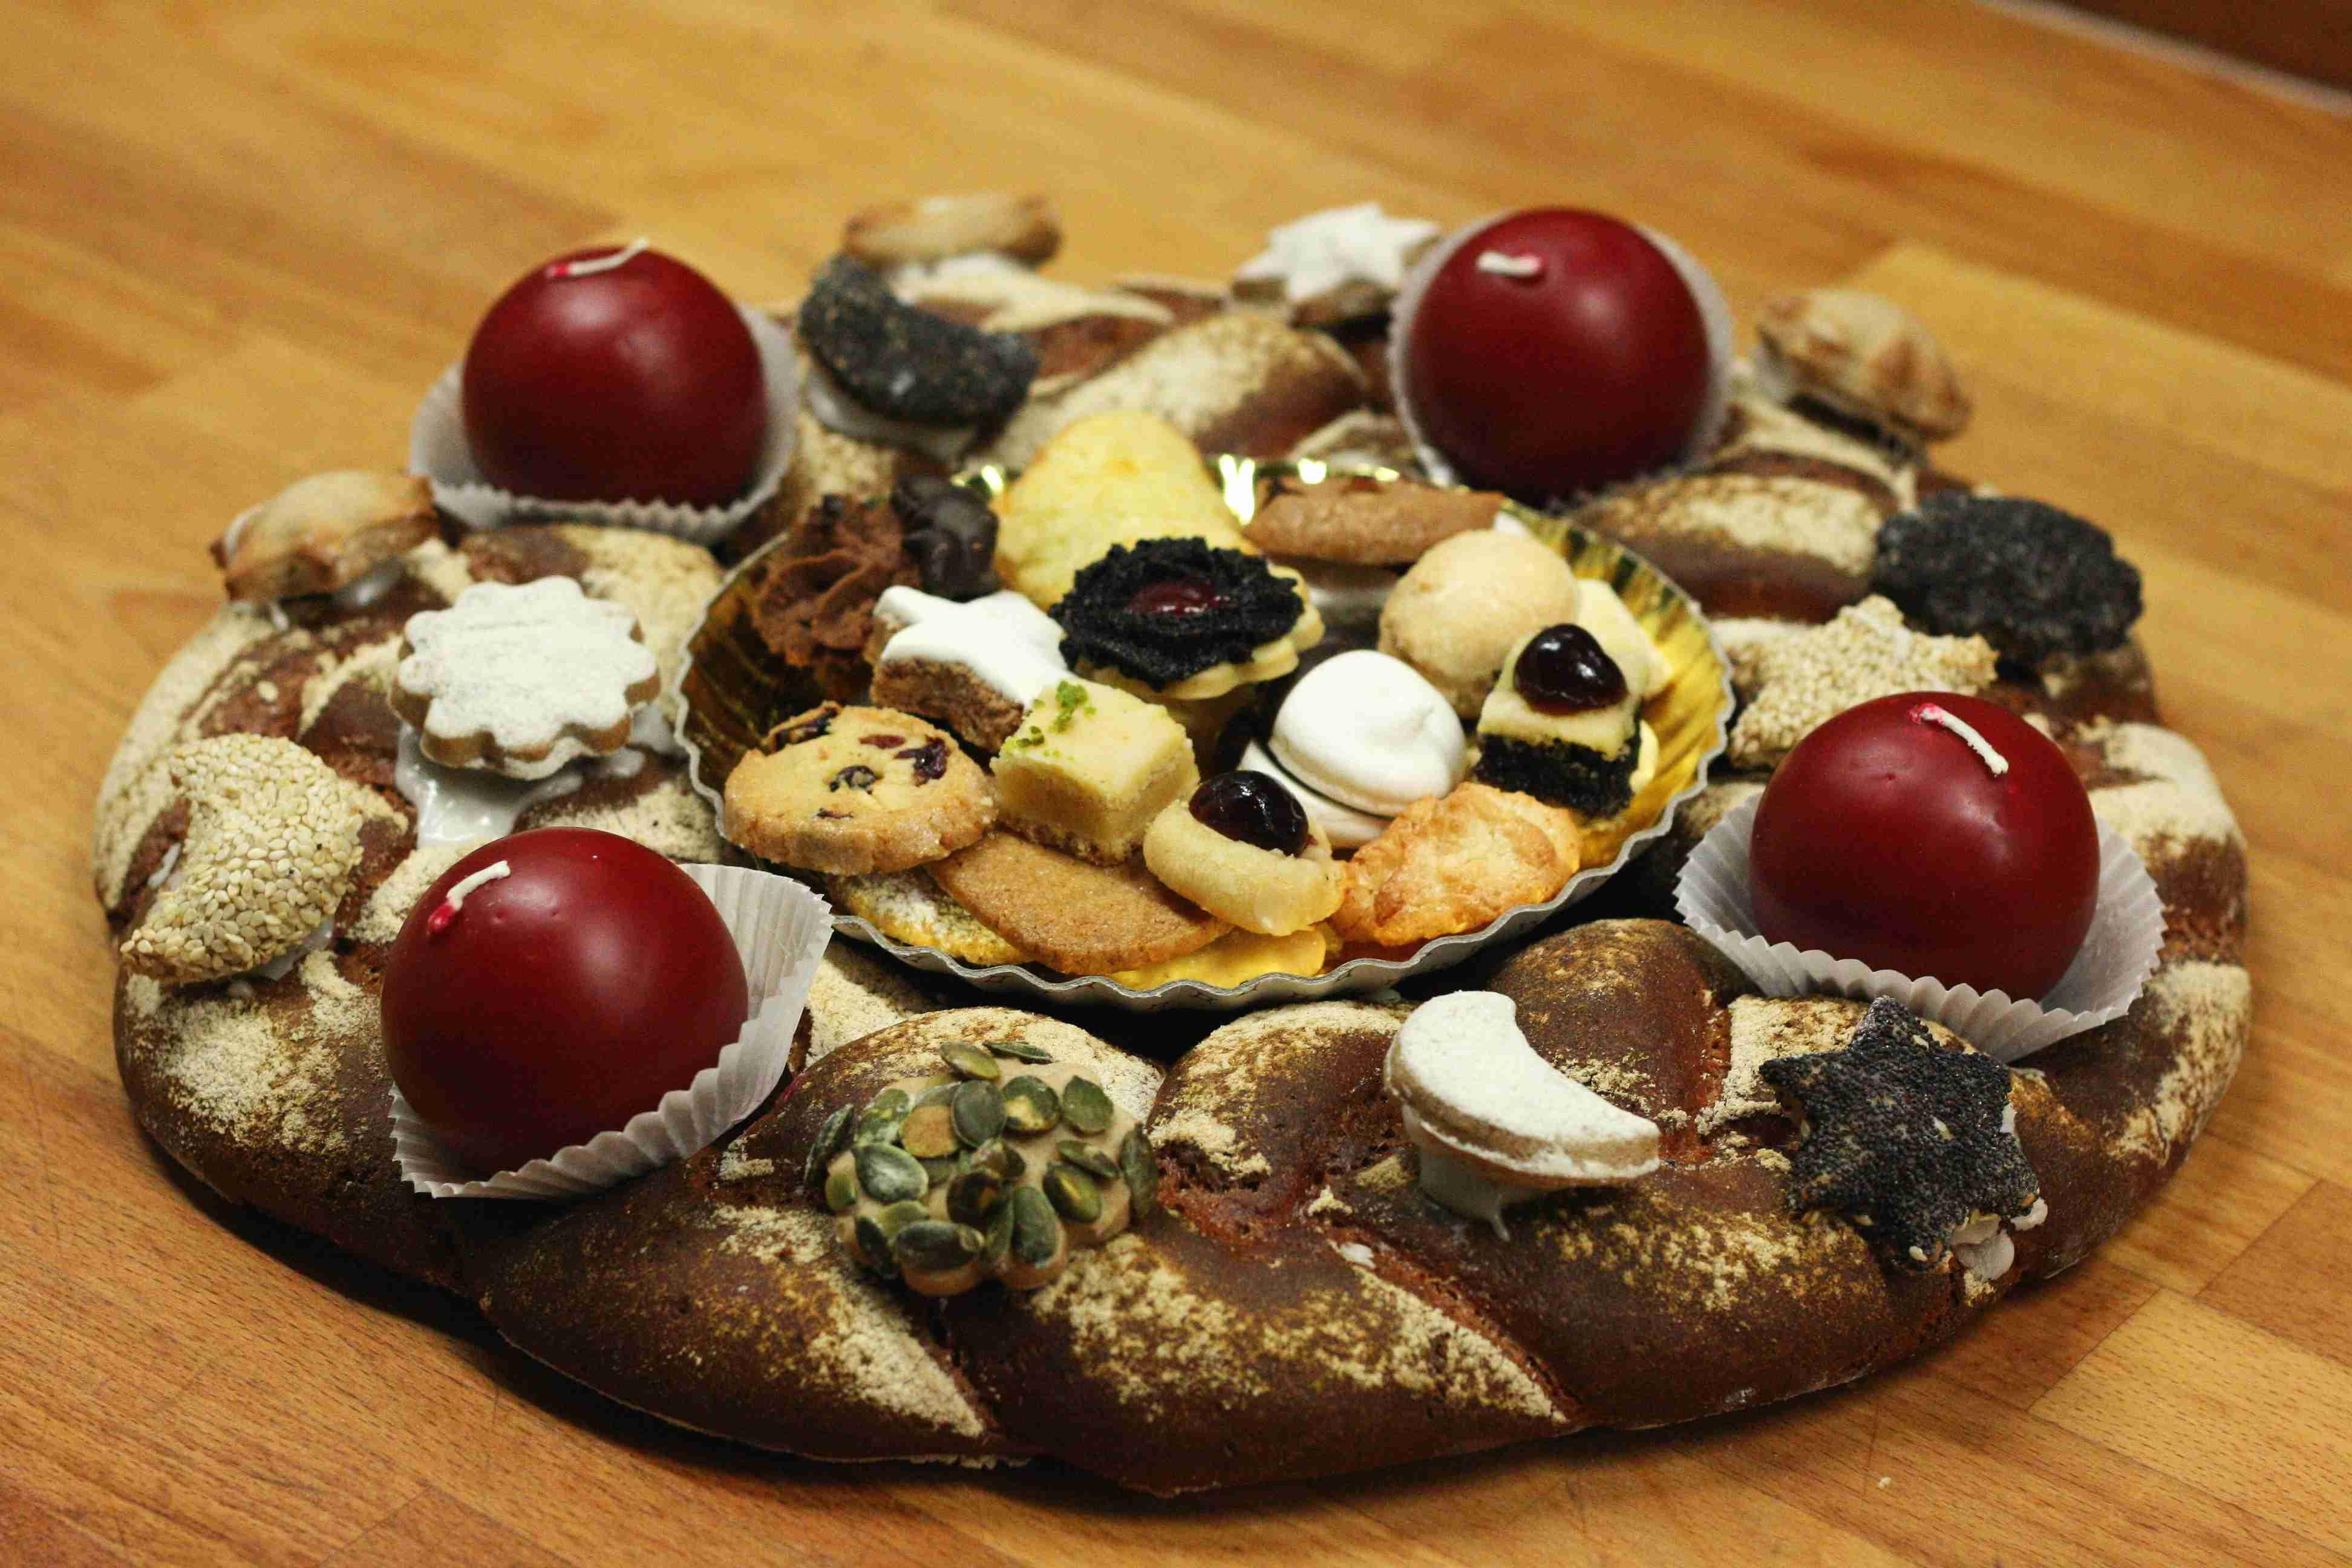 Adventskranz aus Brotteig